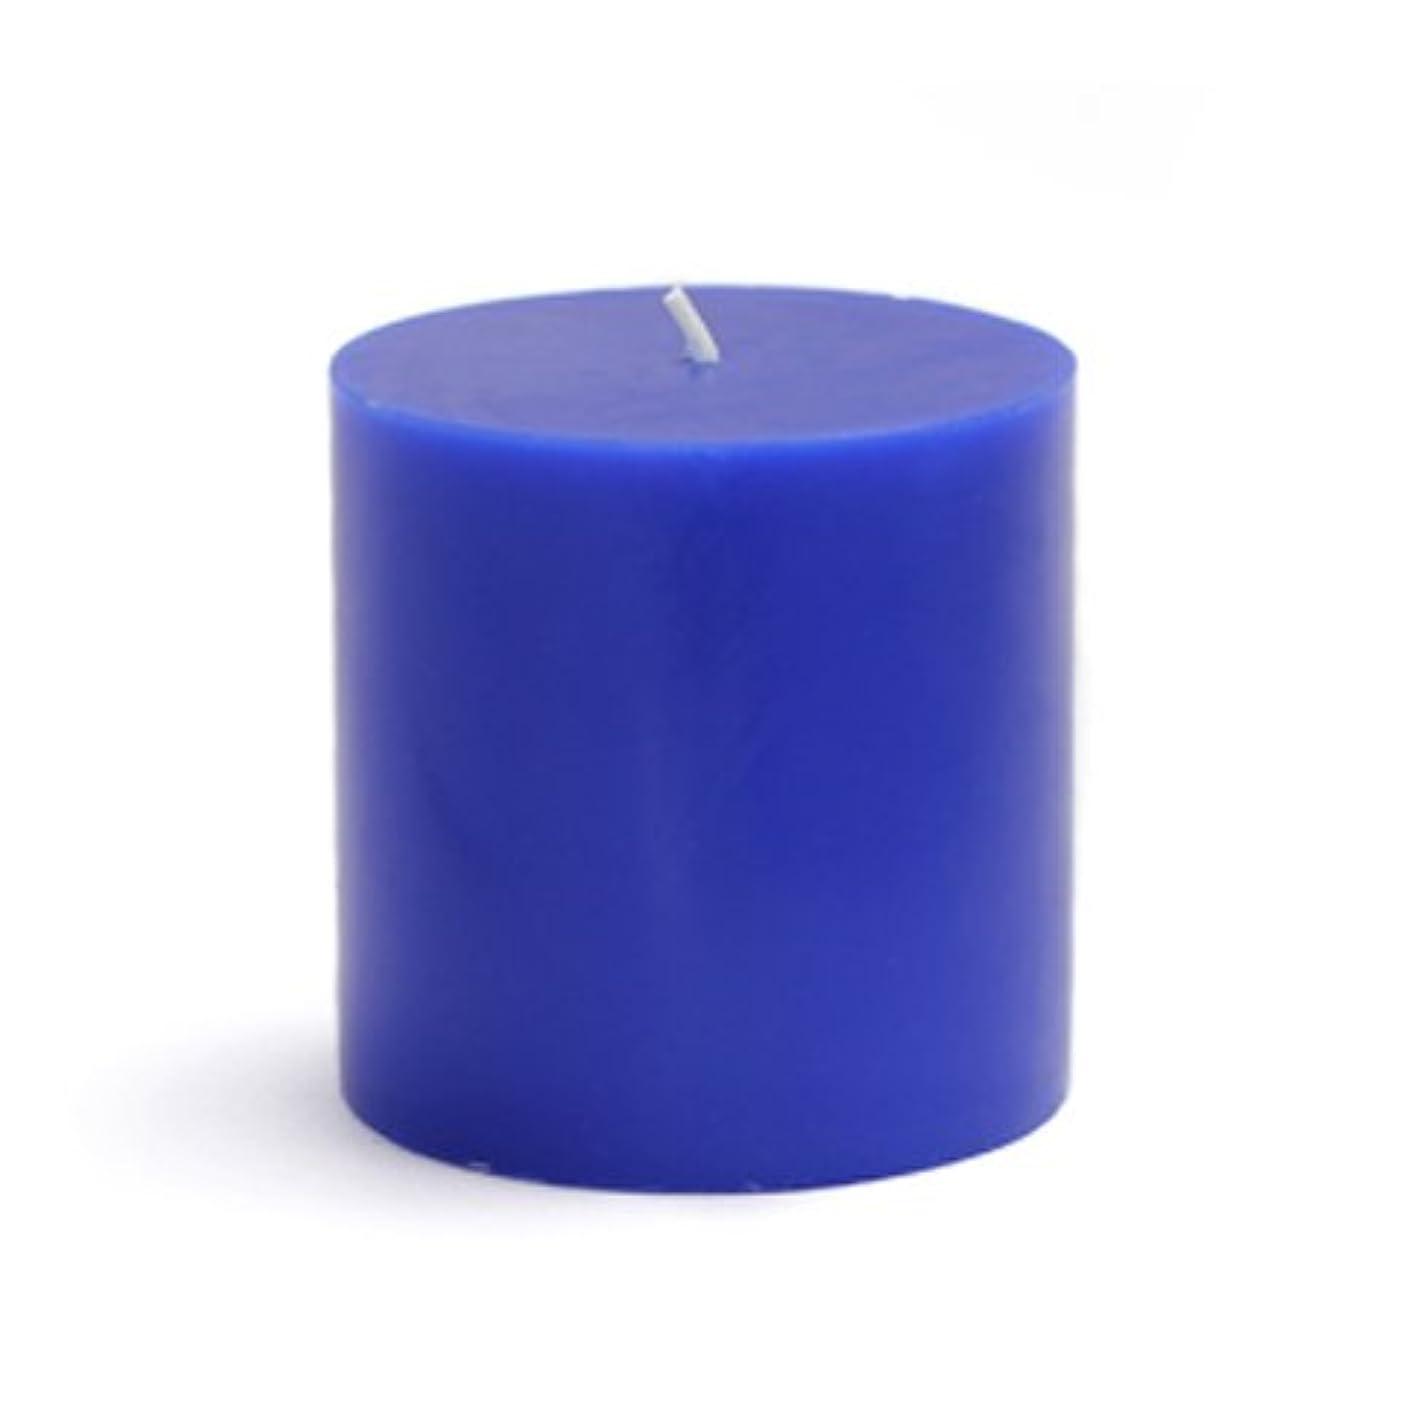 運河外部ギャップZest Candle CPZ-077-12 3 x 3 in. Blue Pillar Candles -12pcs-Case- Bulk